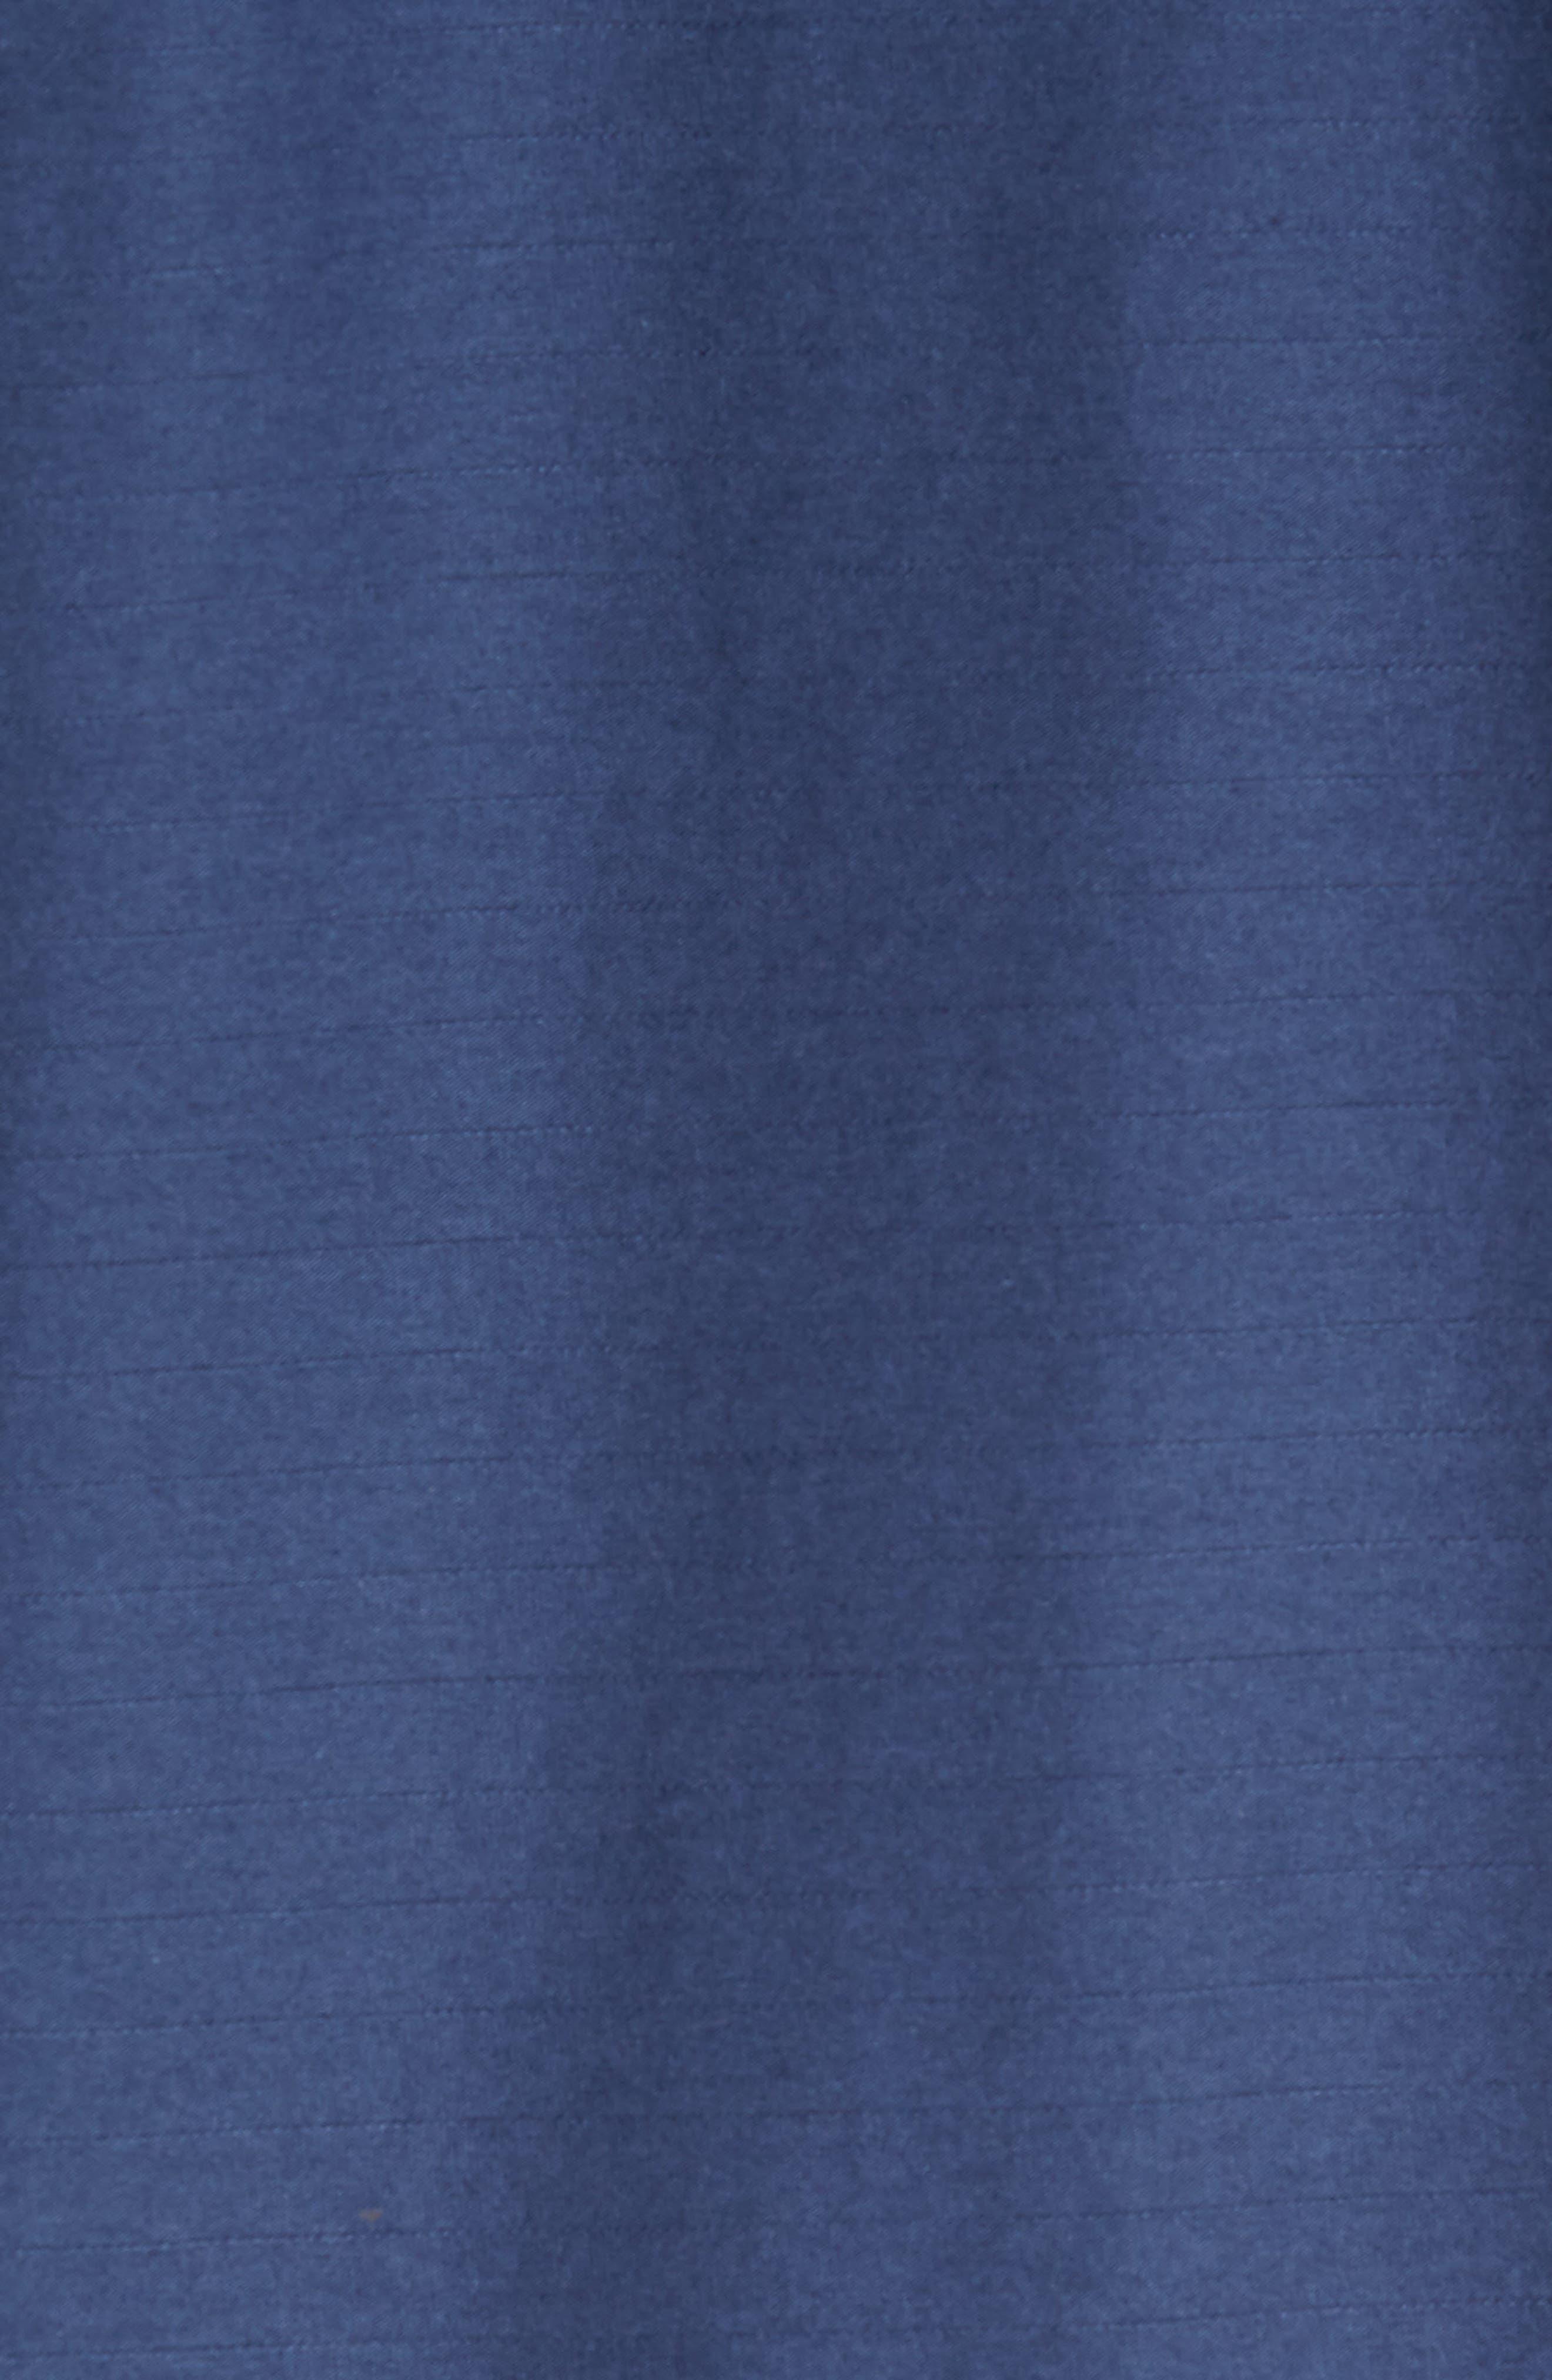 Pima Cotton & Modal V-Neck T-Shirt,                             Alternate thumbnail 5, color,                             NAVY